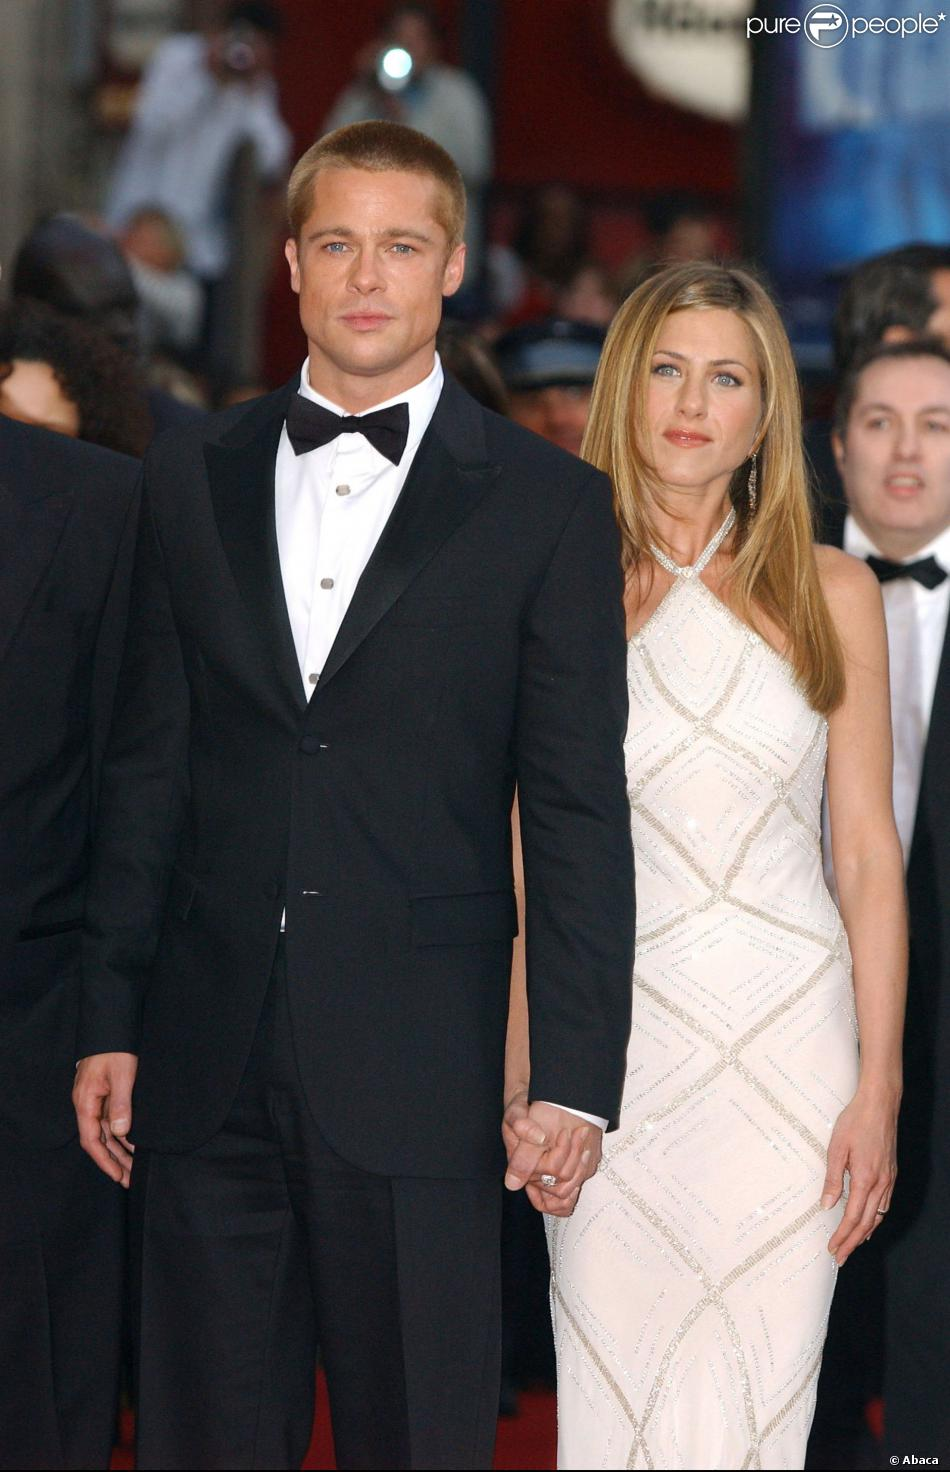 Jennifer Aniston And Brad Pitt 2013 Jennifer Anisto...